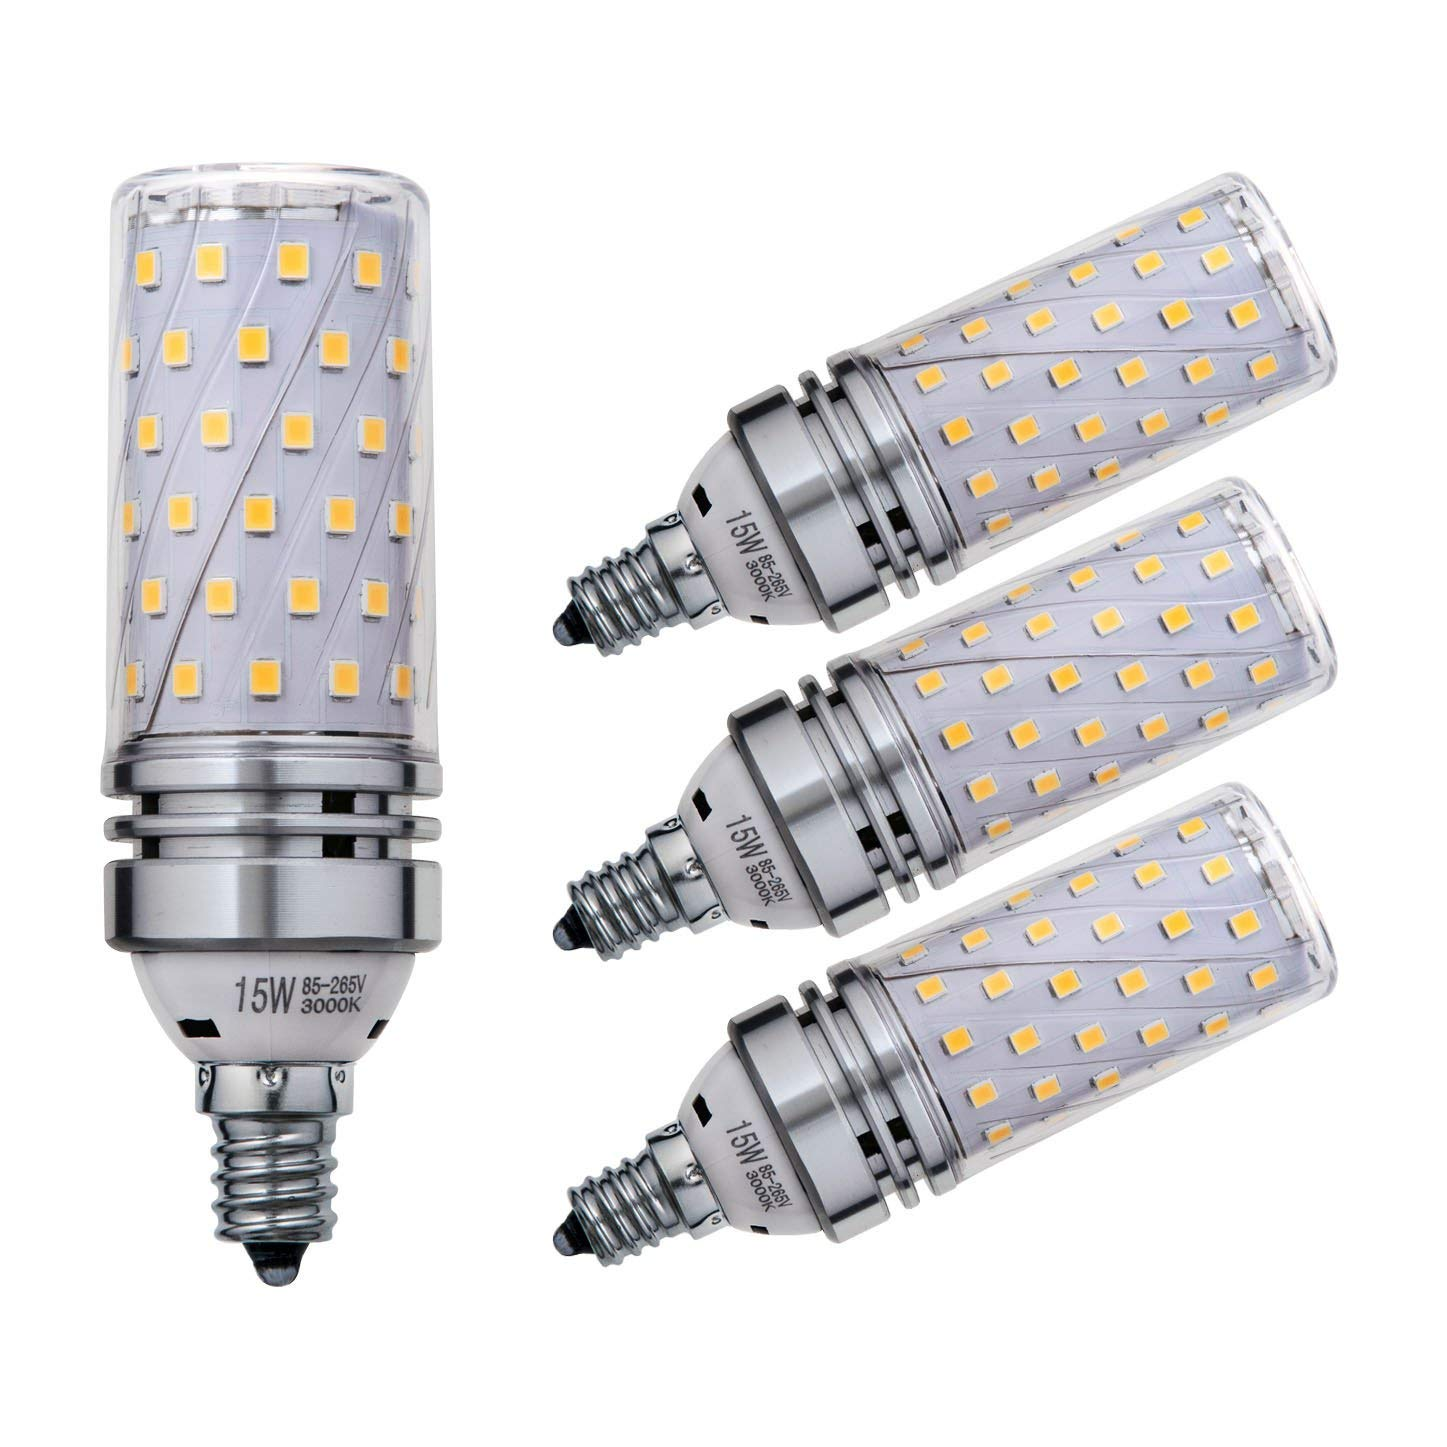 Sagel E12 LED Corn Bulbs 15W, 120W Incandescent Bulbs Equivalent, 3000K Warm White Candelabra E12 SES Bulbs, Non-Dimmable, 1500Lm, Small Edison Screw Corn Light Bulbs, 4-Pack